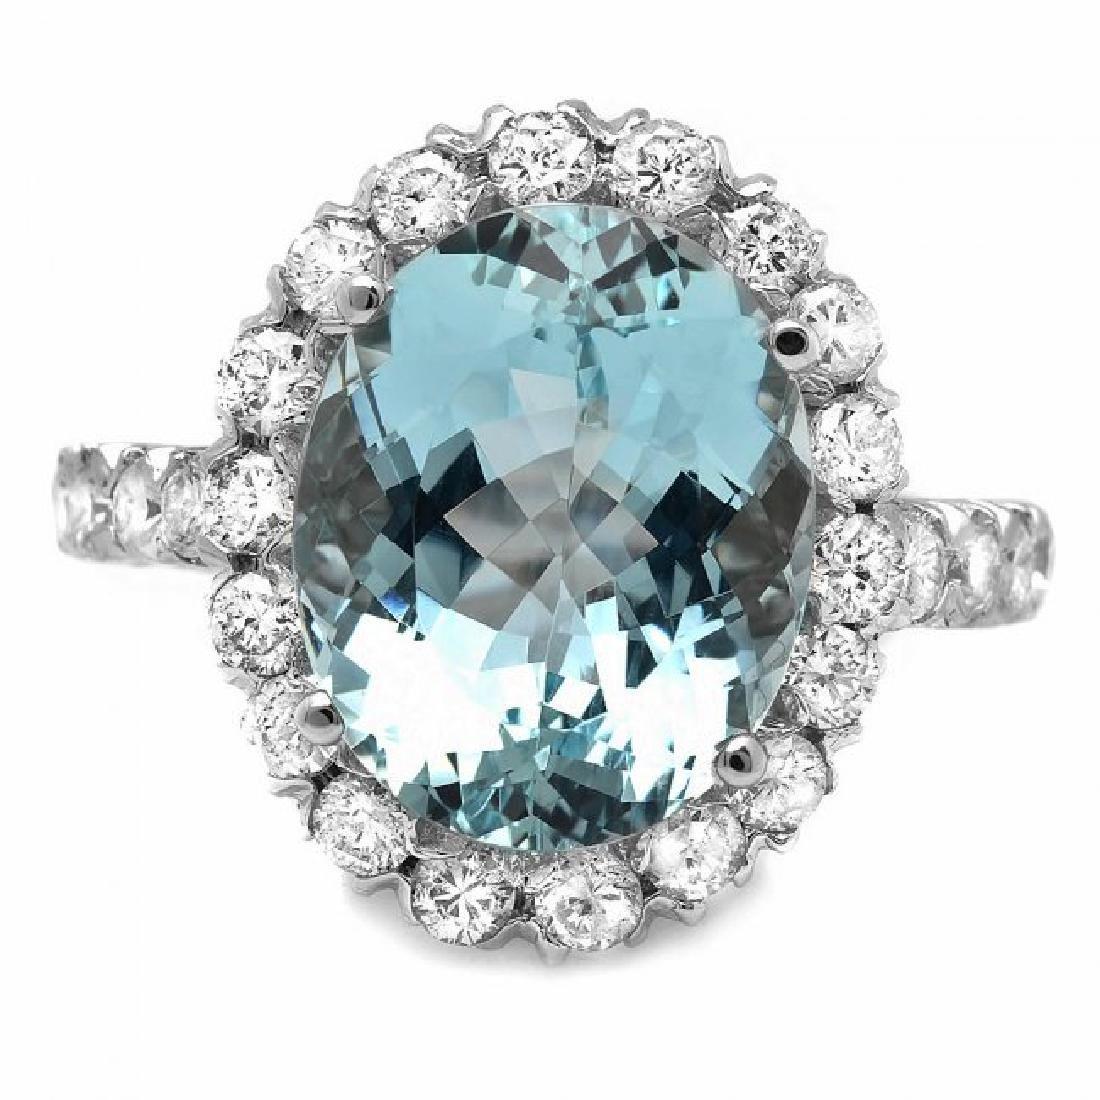 14k Gold 7.50ct Aquamarine 1.55ct Diamond Ring - 2